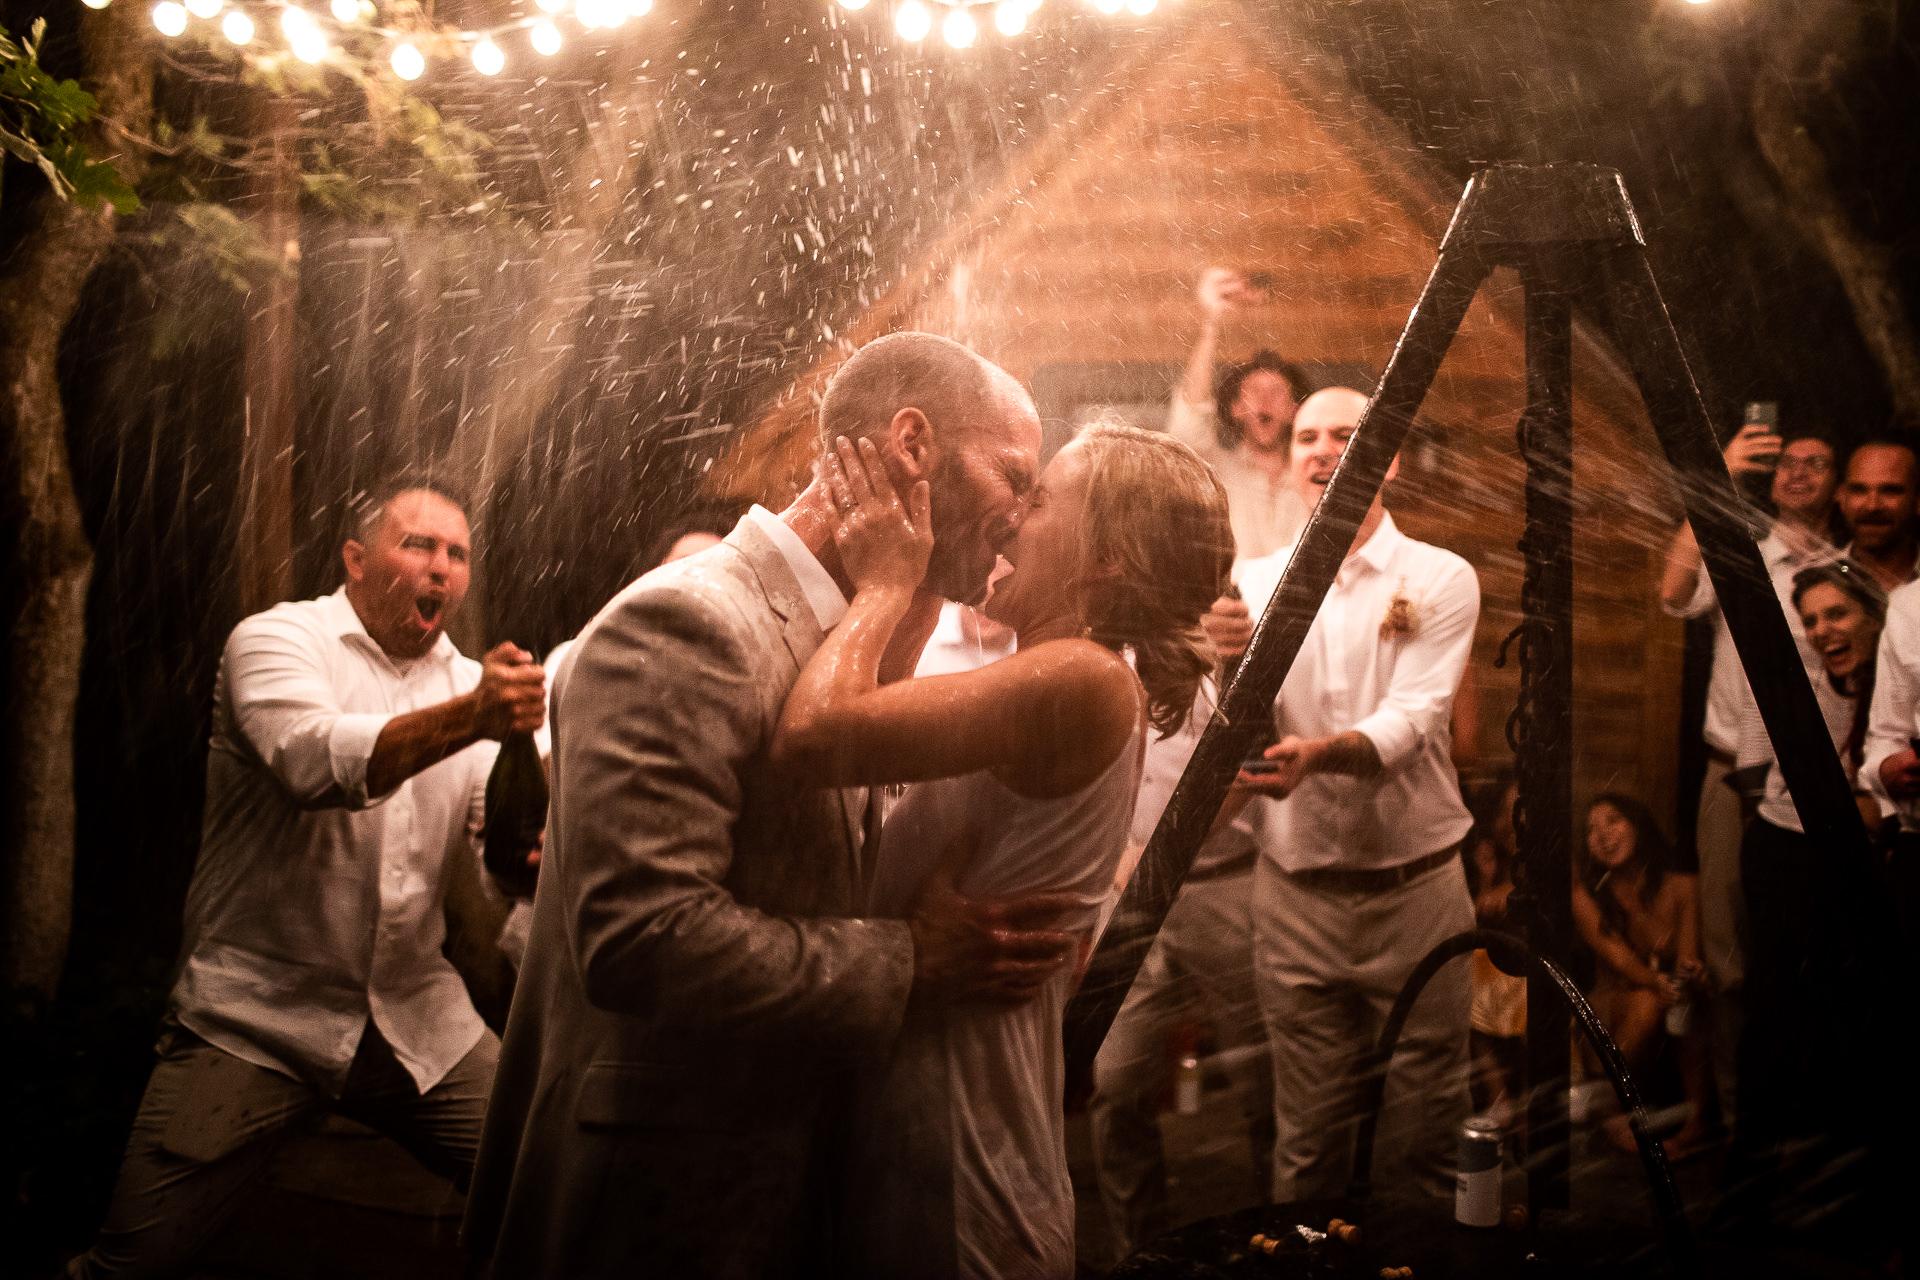 Wedding Champagne Send off